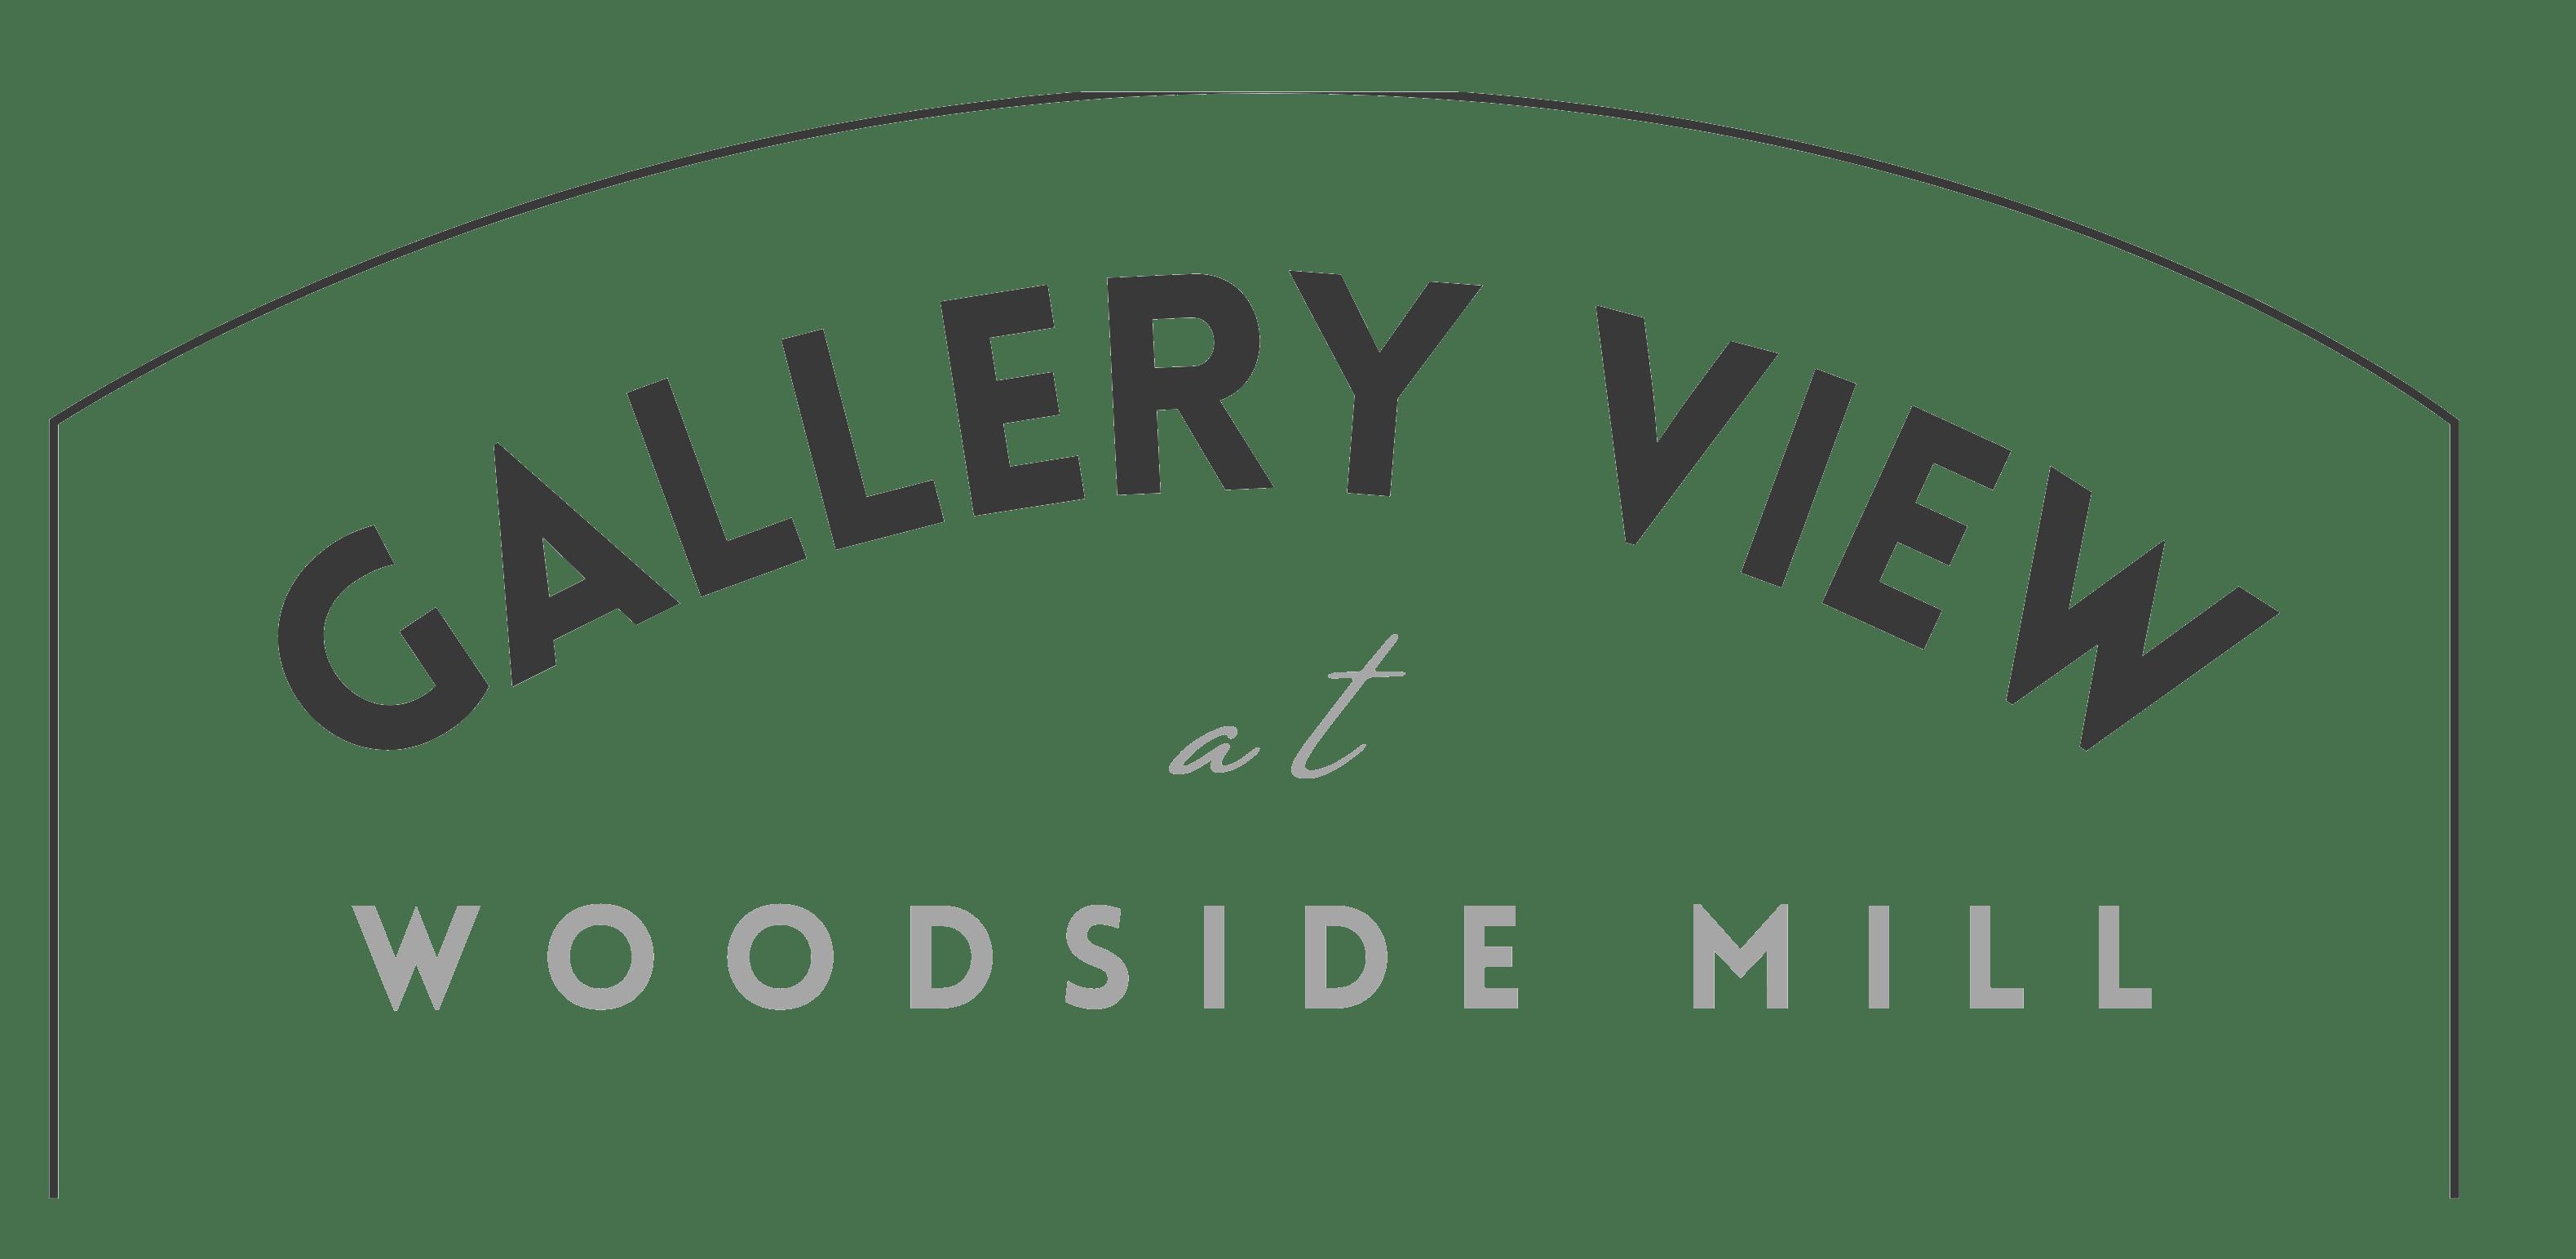 Gallery View company logo